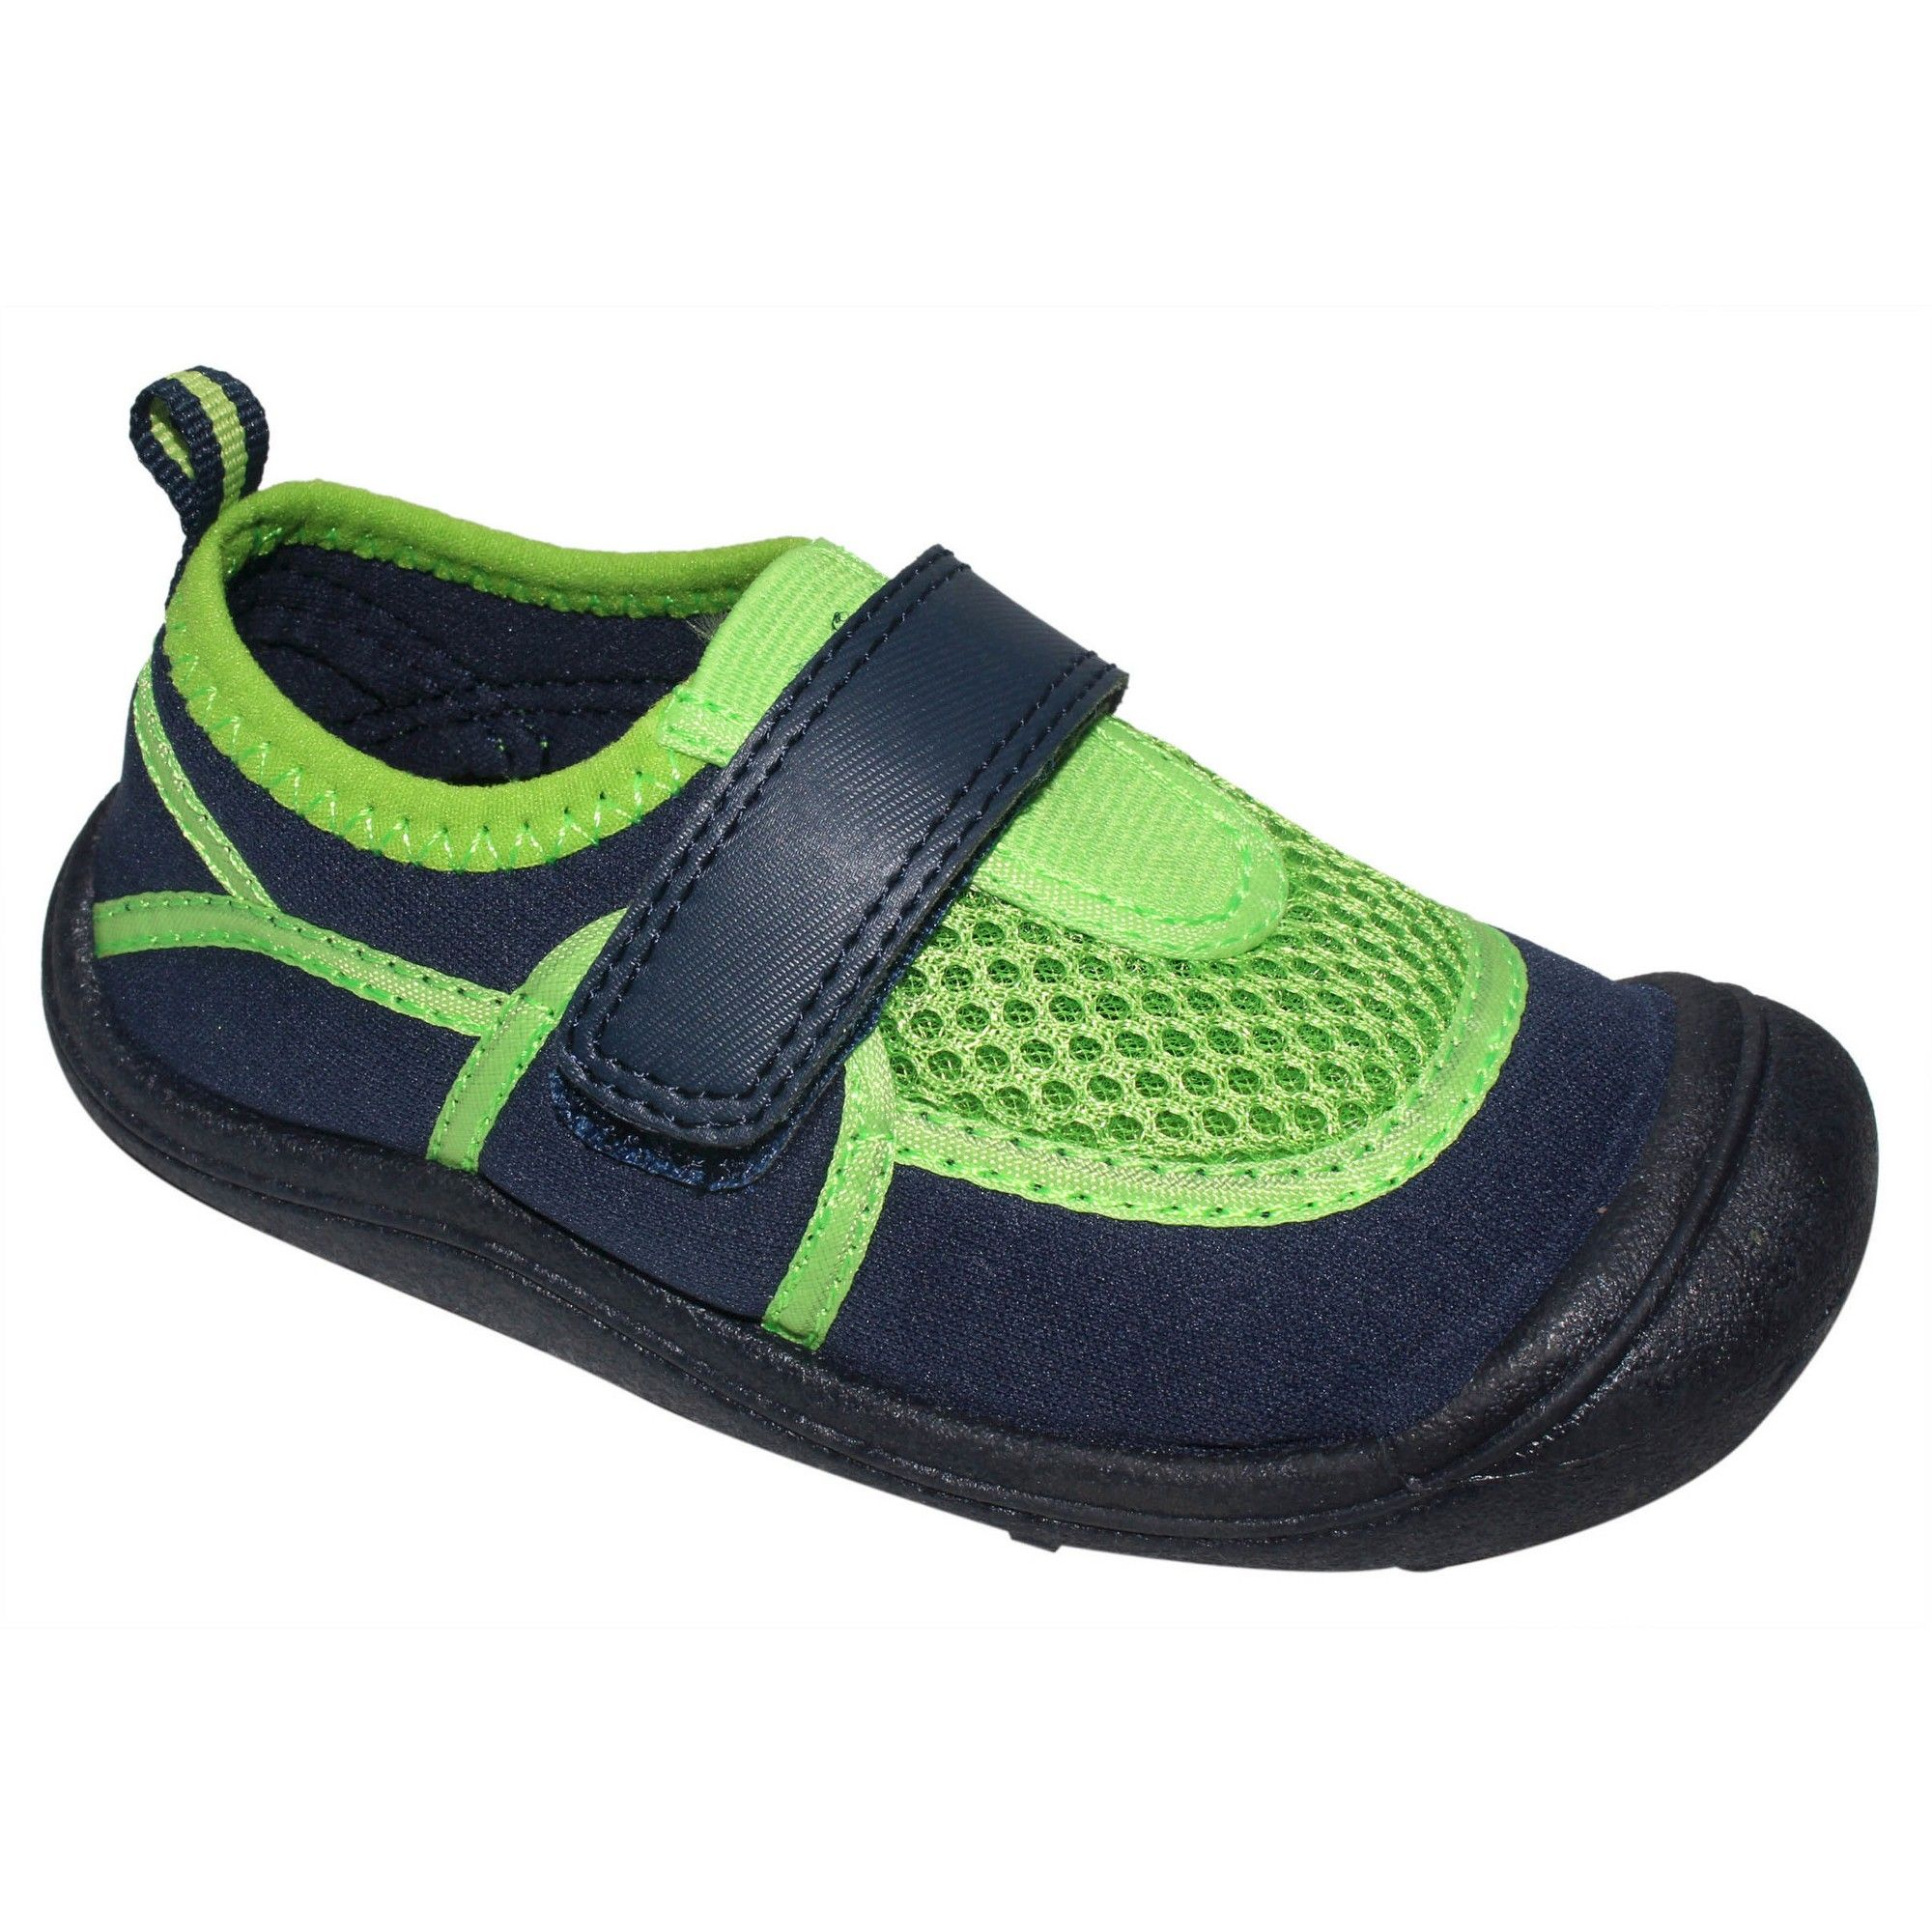 Toddler Boys Duke Water Shoes Cat & Jack Blue Green XL Blue